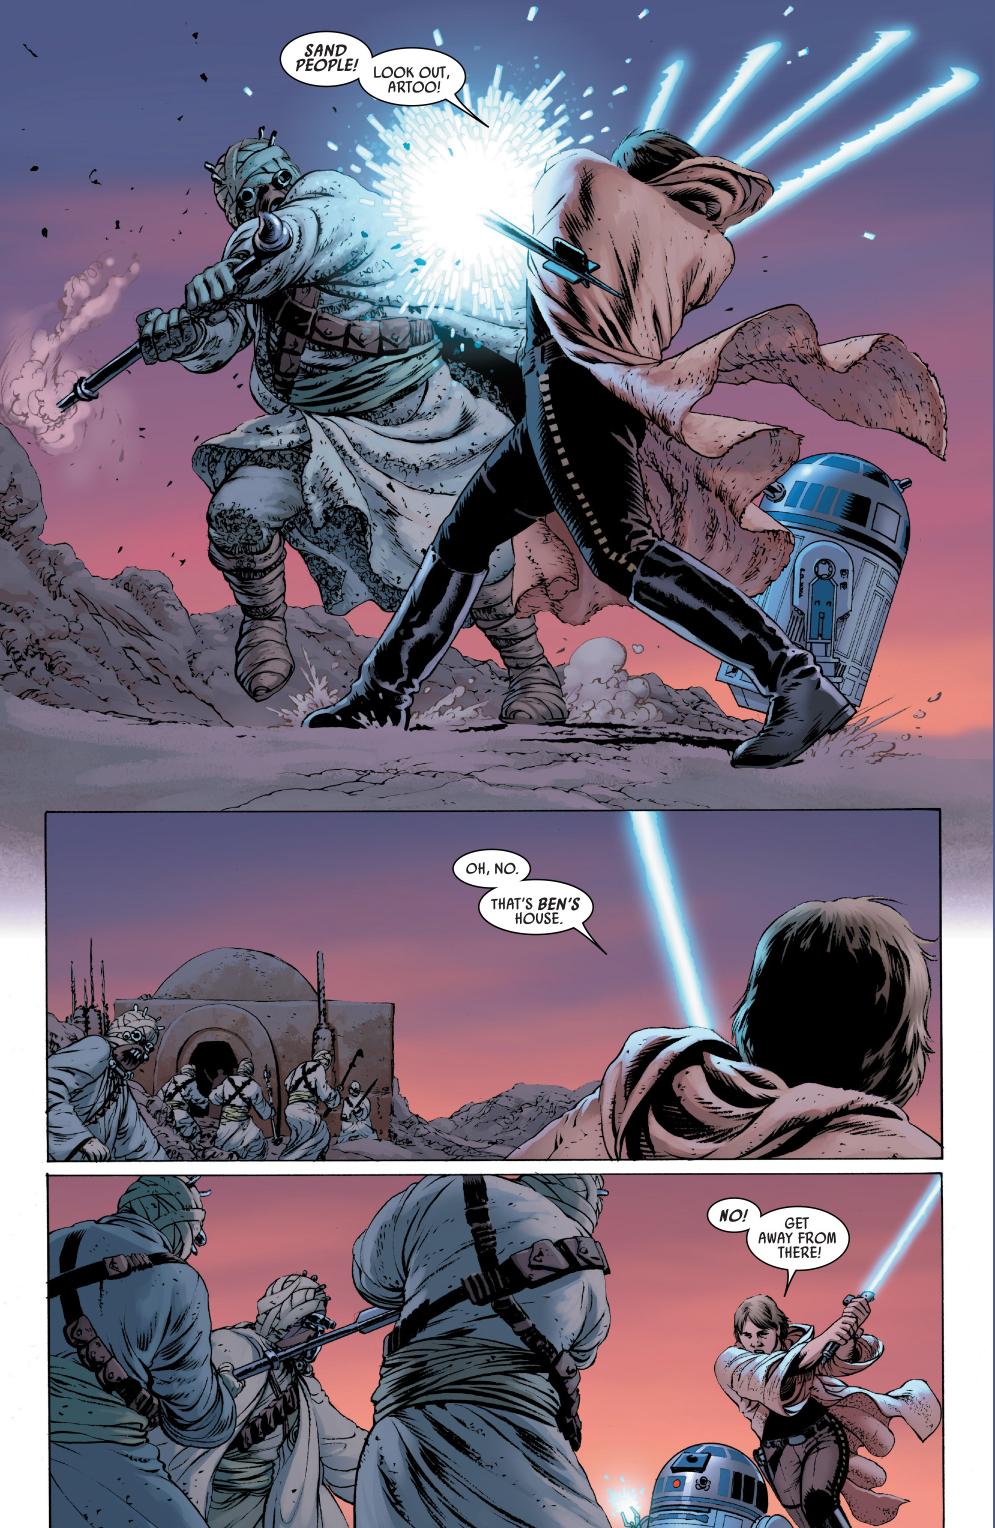 luke skywalker vs tusken raiders